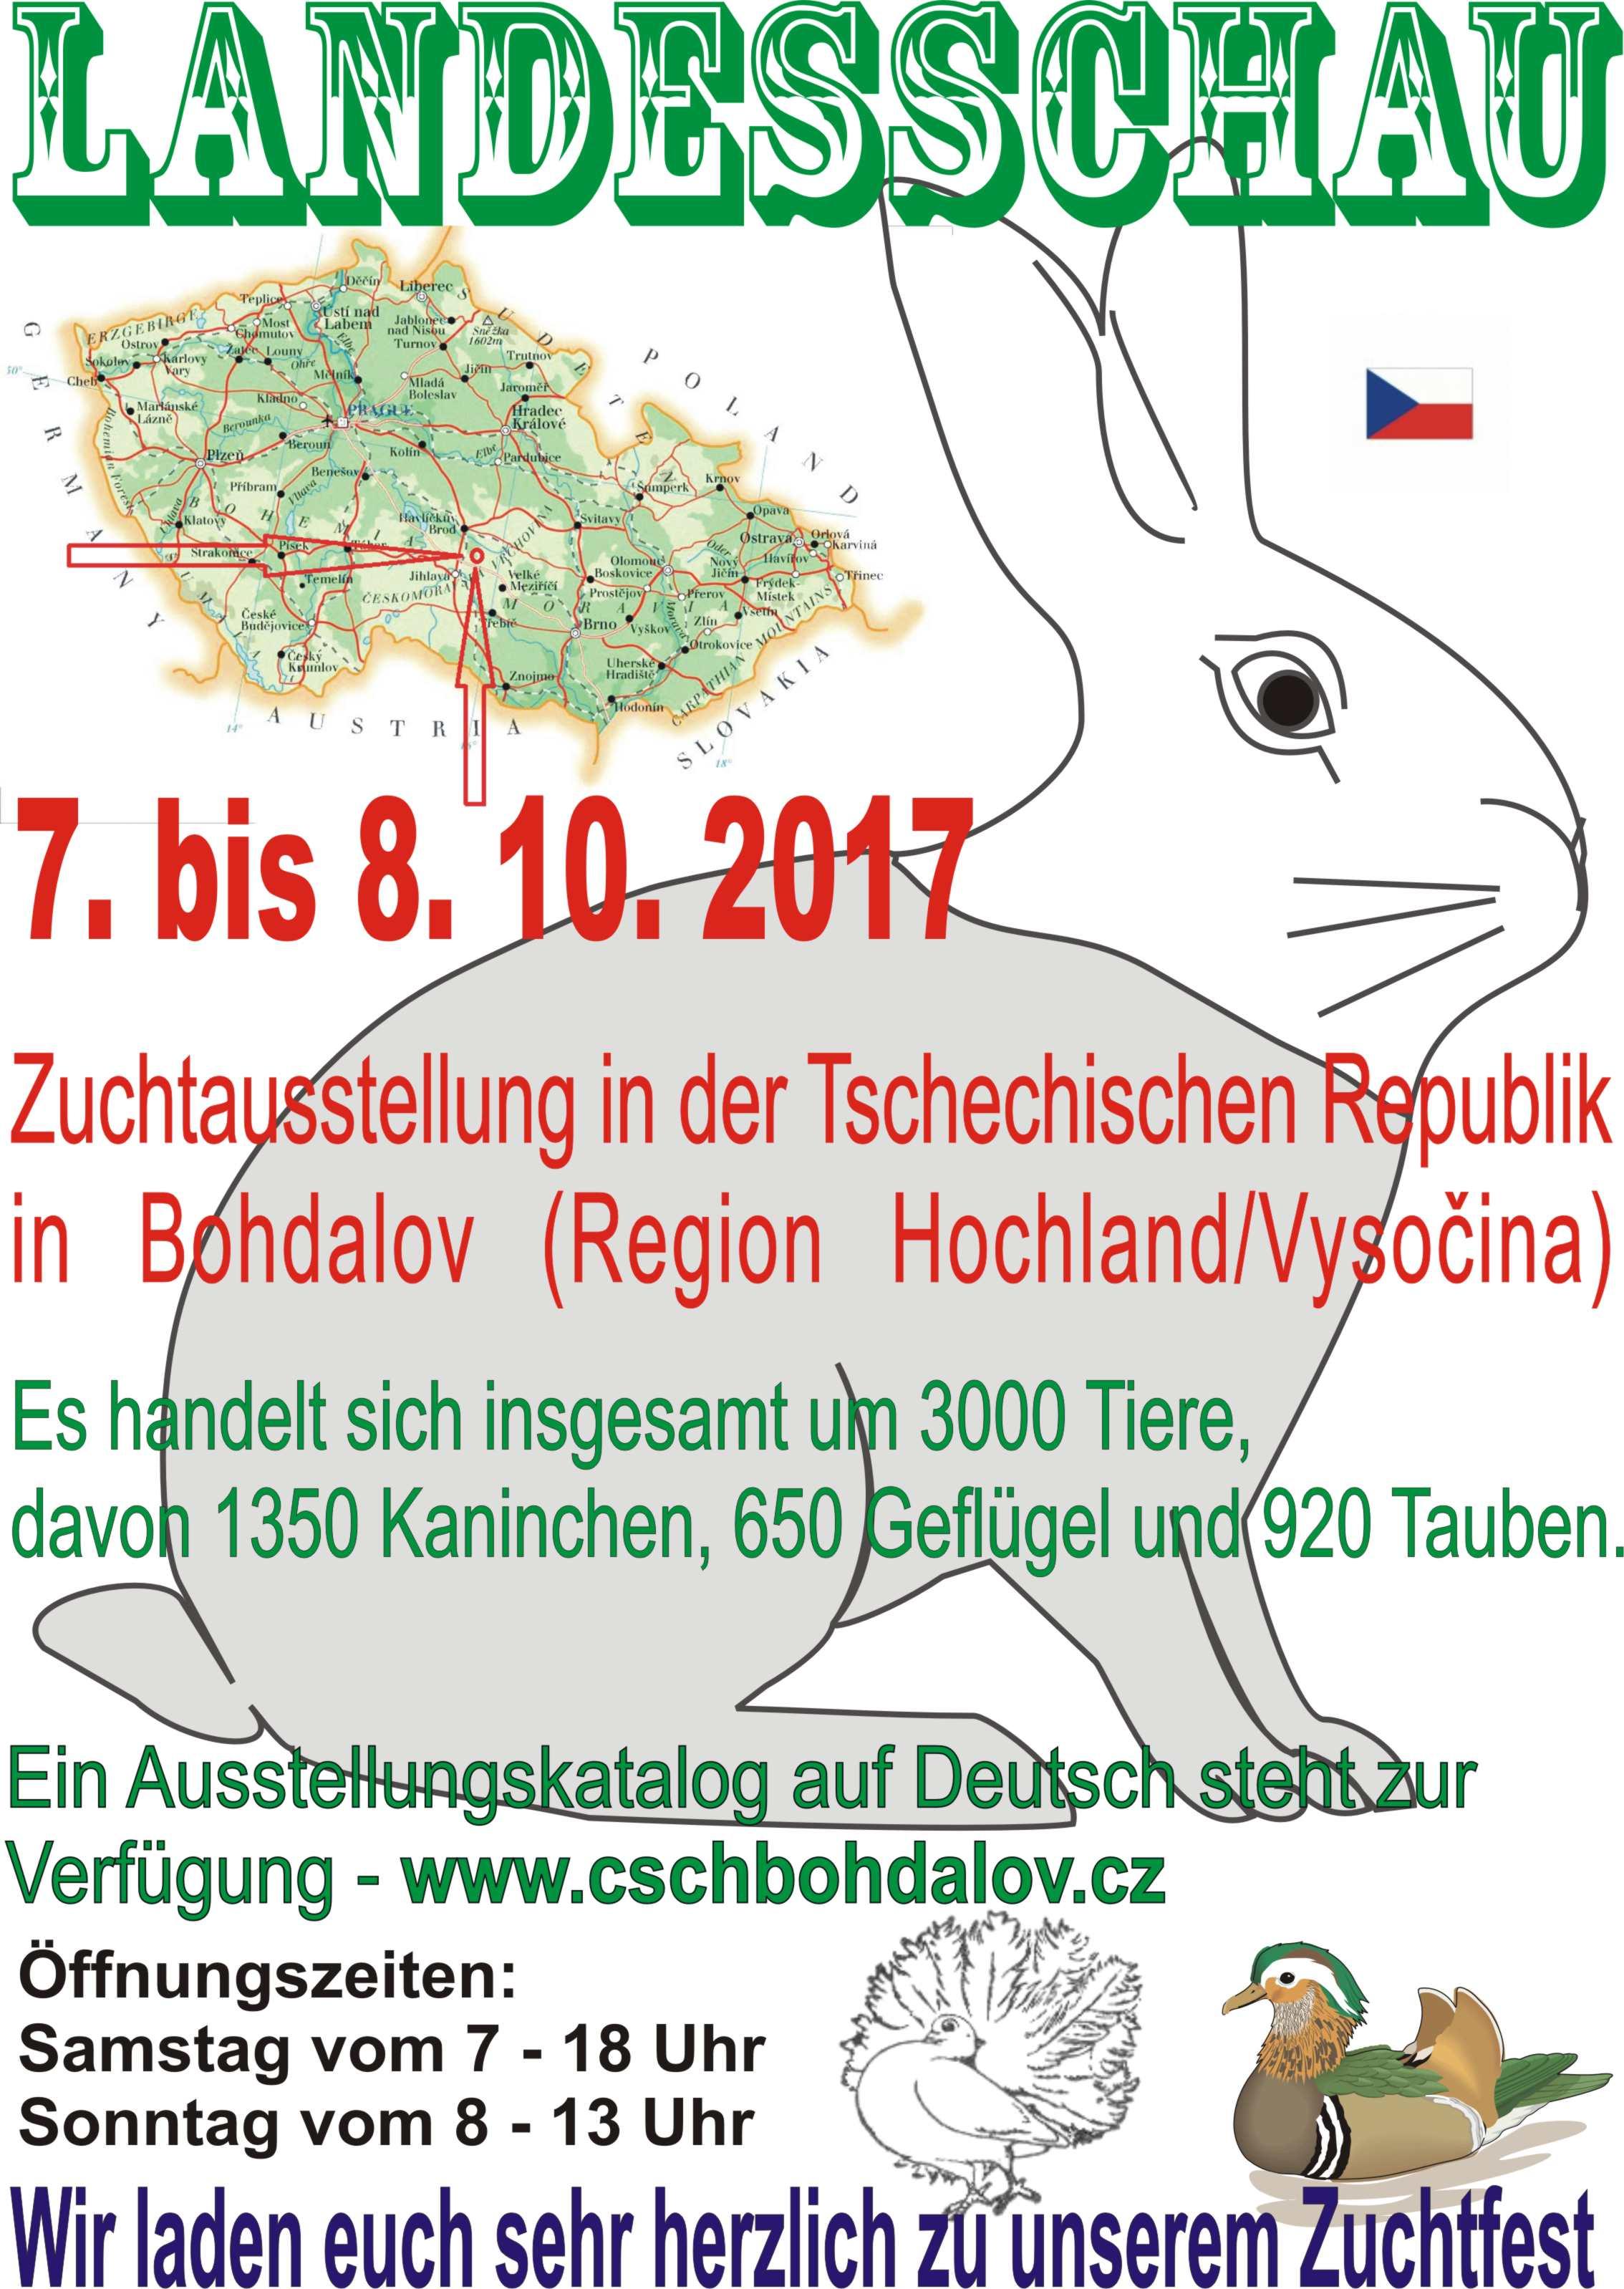 http://www.cschbohdalov.cz/bohdalov/2017/plakat2017DE.jpg